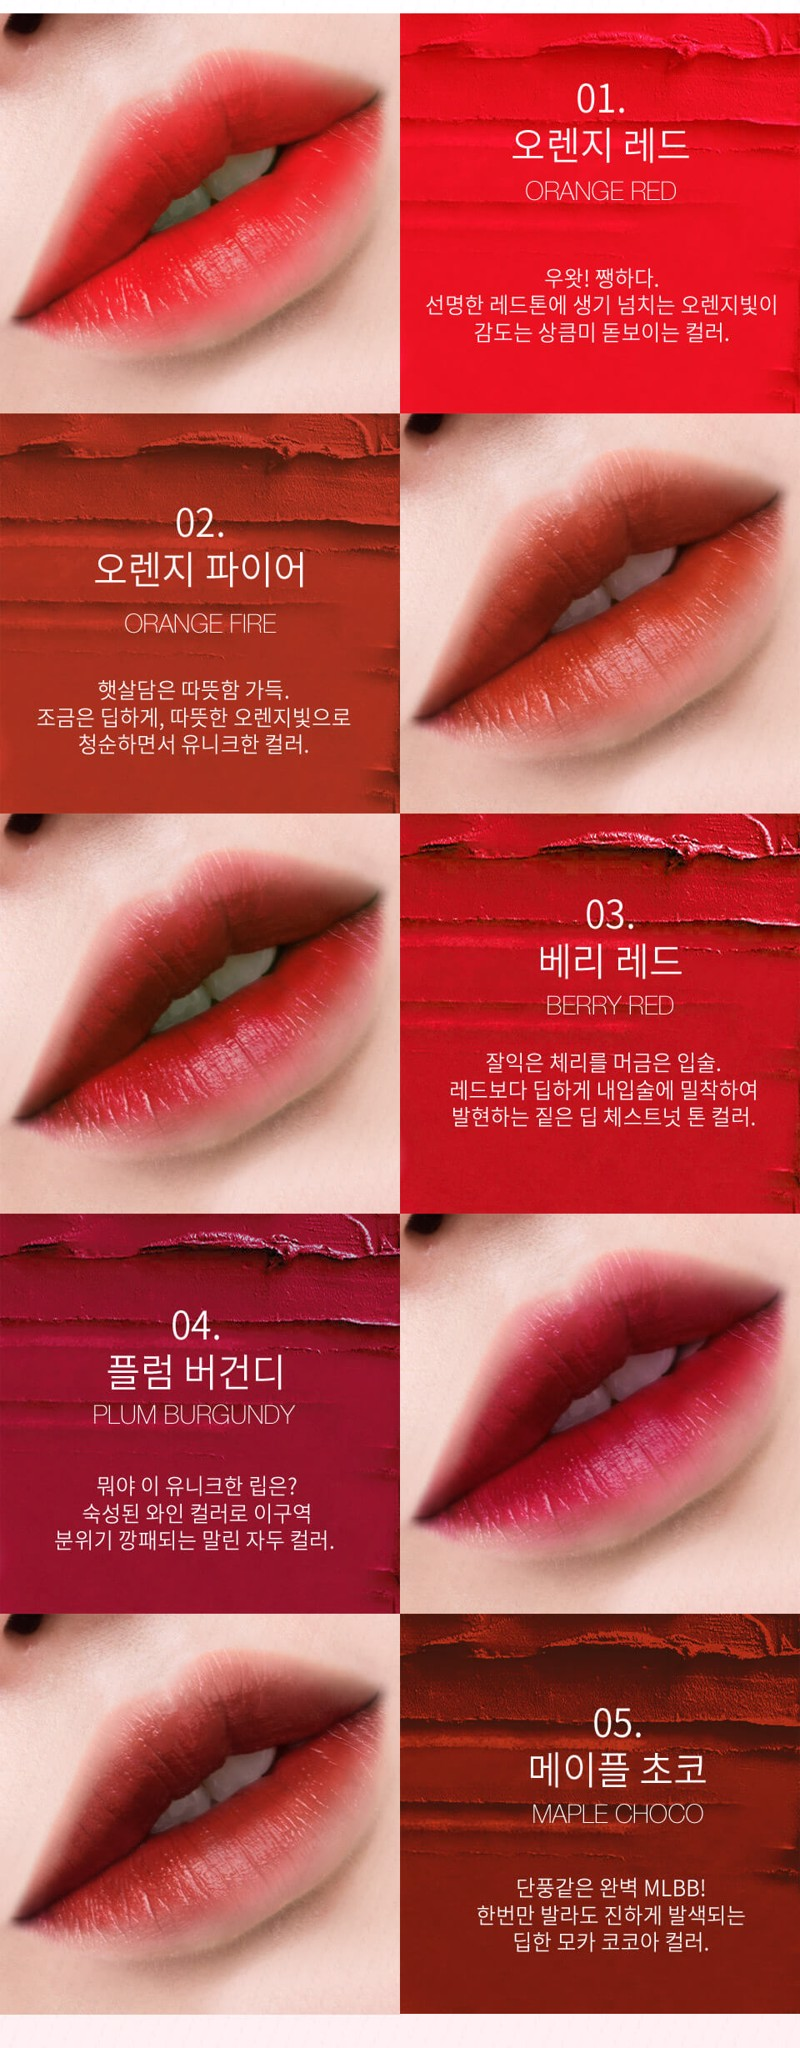 carenel-ruby-airfit-velvet-tint-bici-cosmetics9